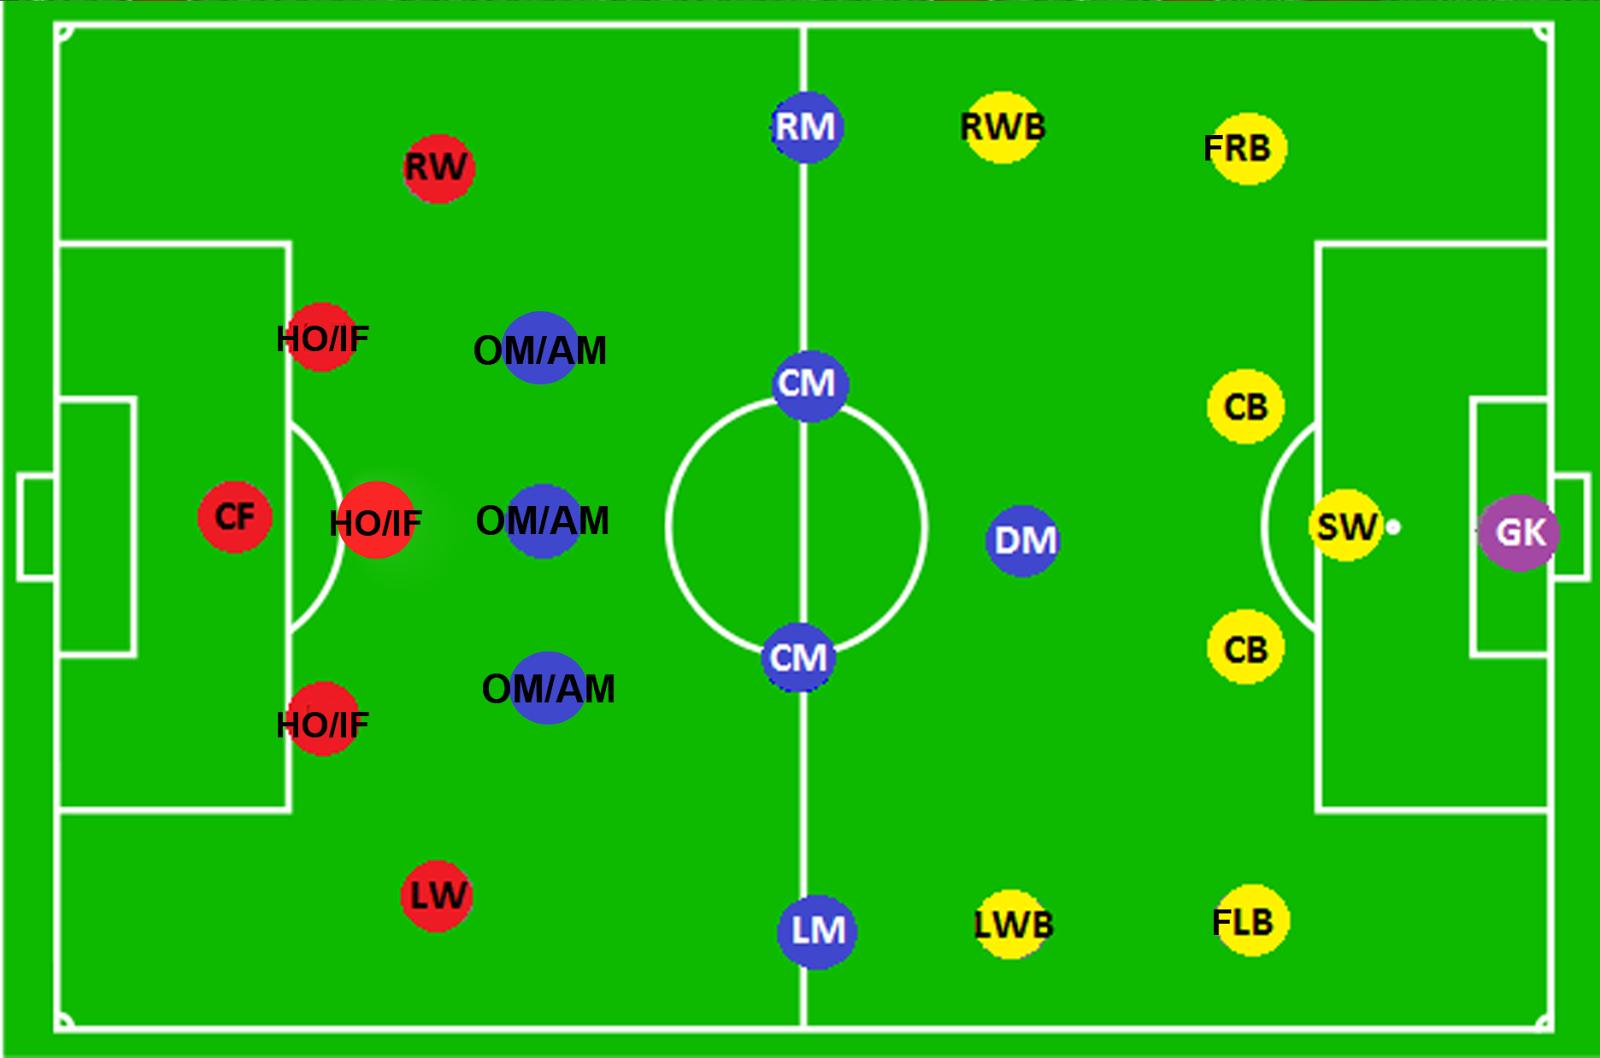 Gambar Lapangan Sepak Bola Lengkap Dengan Ukuran Dan Posisi Pemain Berbagai Ukuran